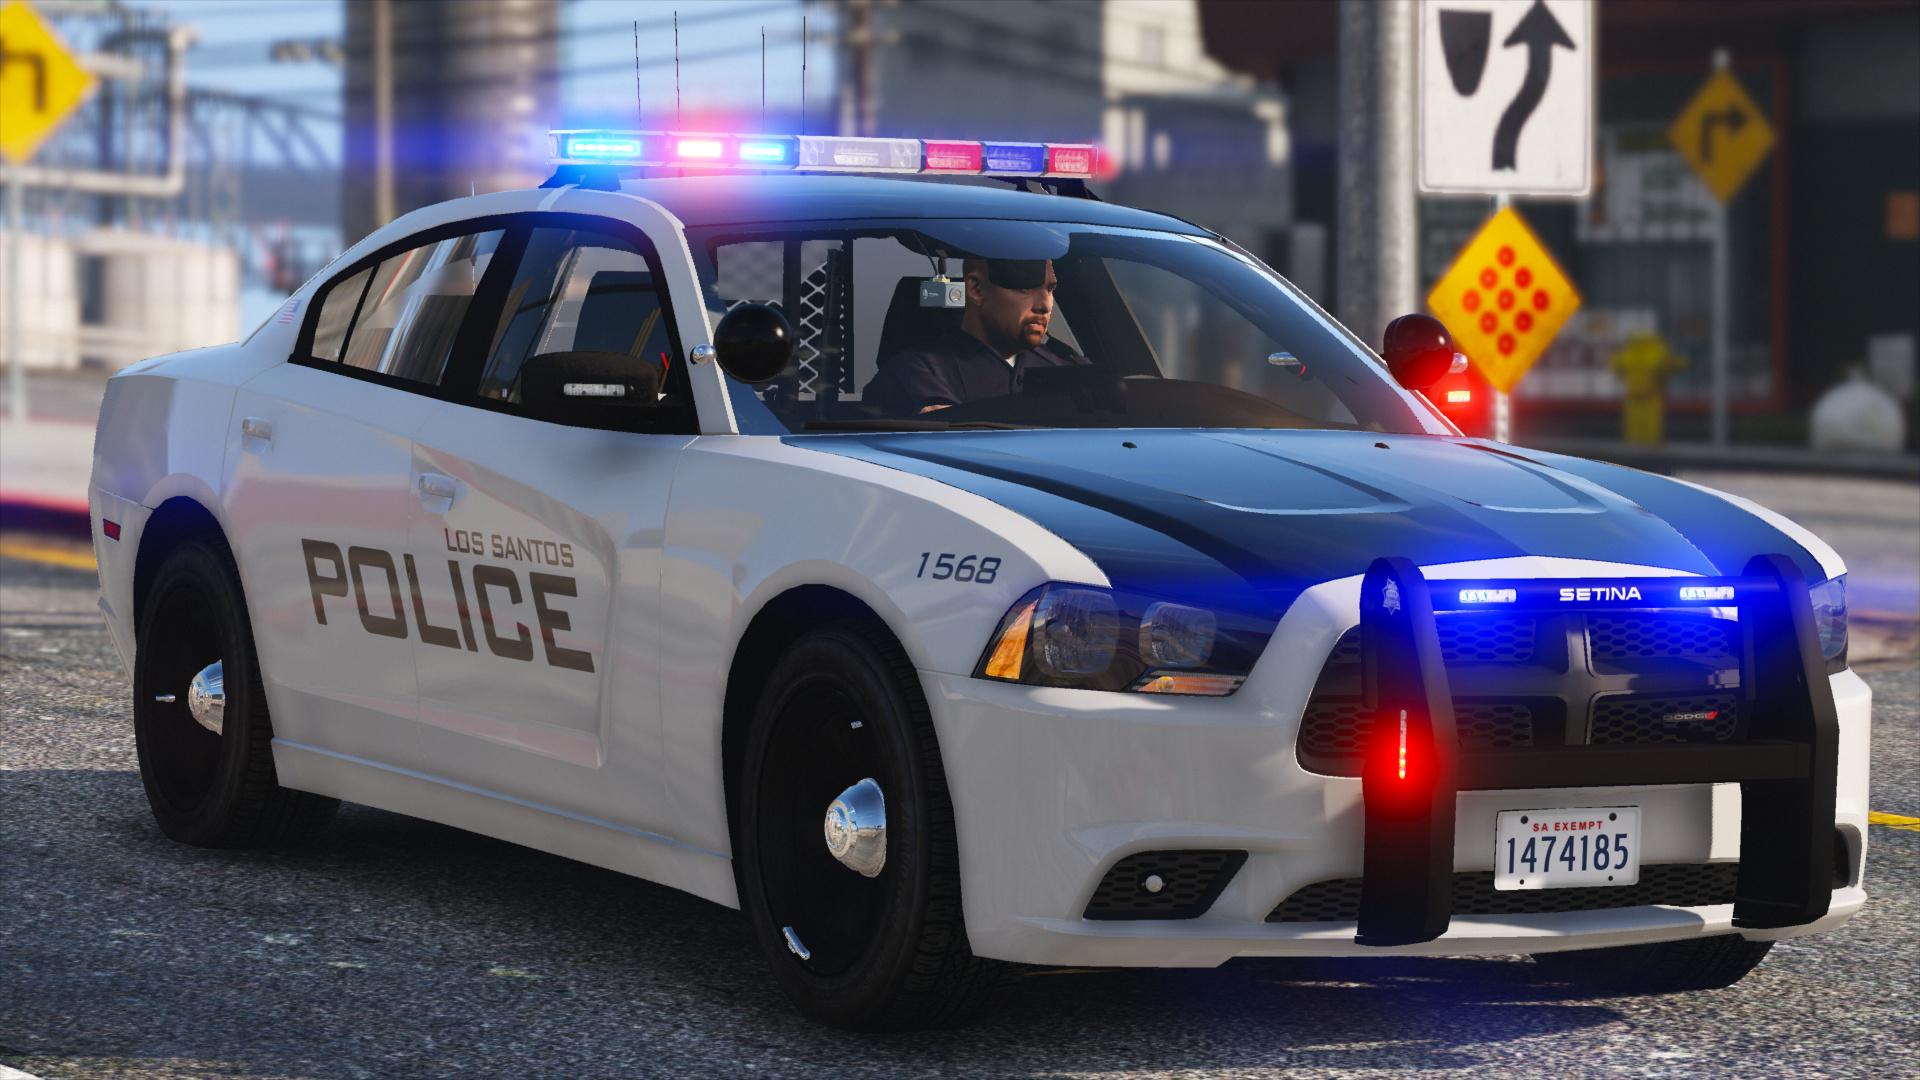 Fivem Police Cars